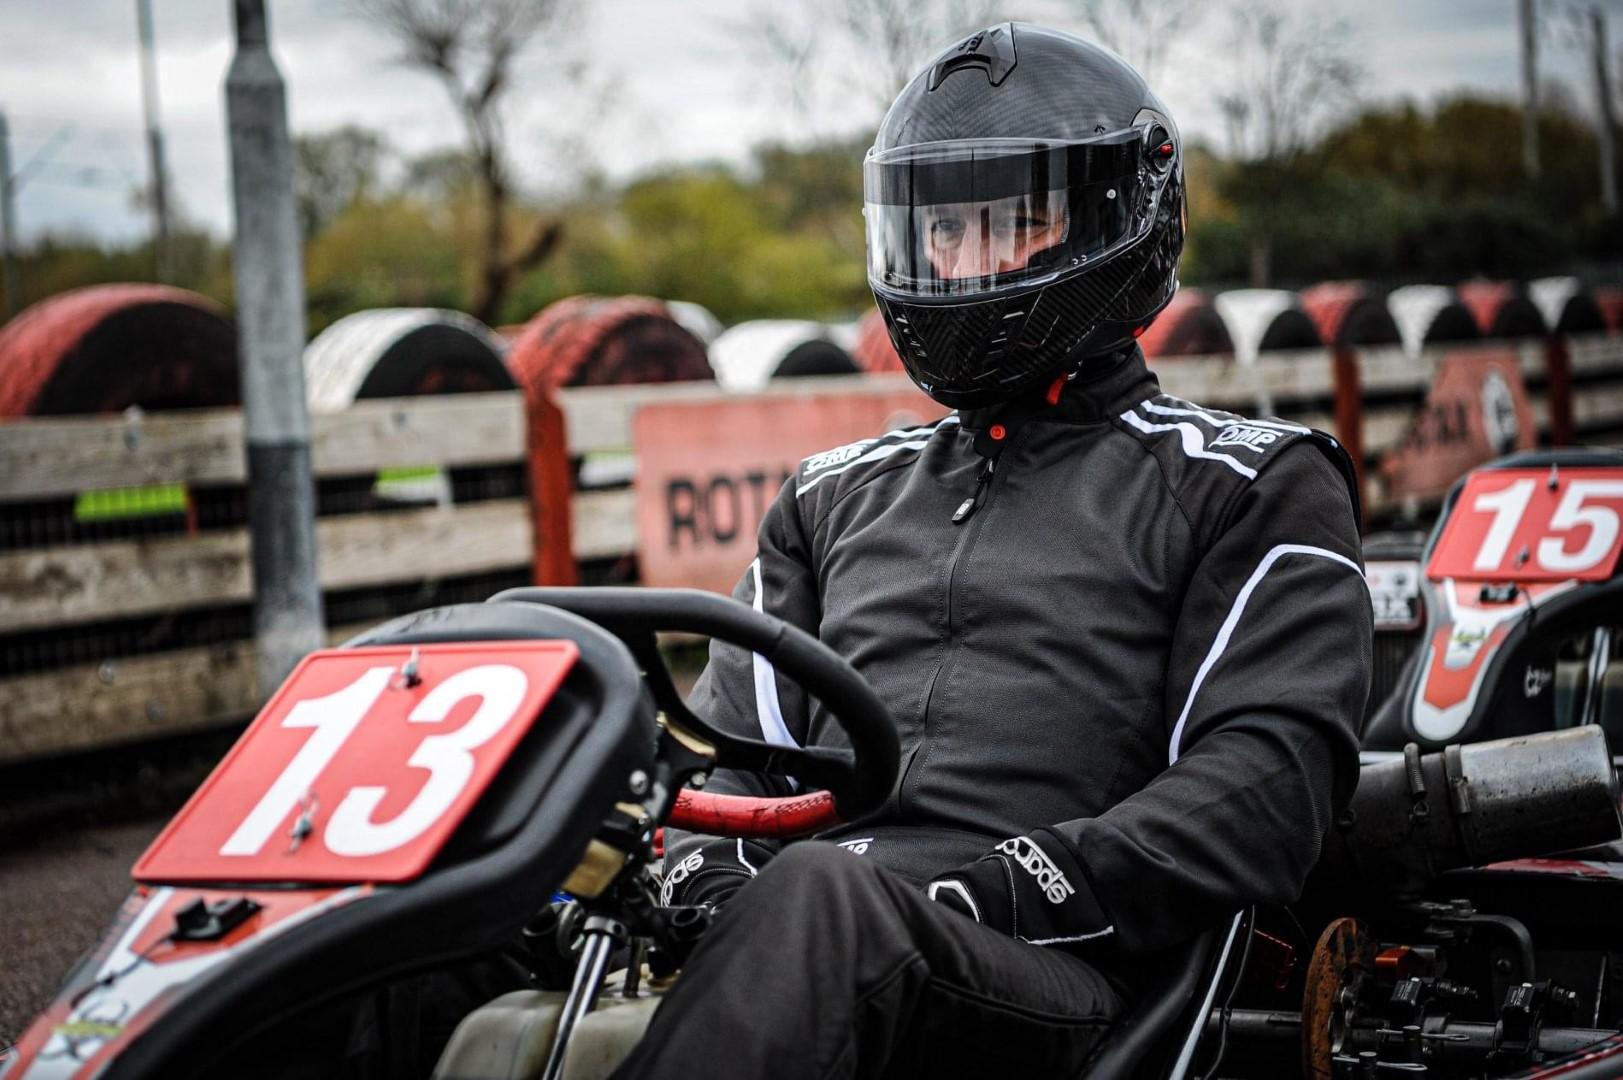 qui-est-ce-marocain-champion-de-karting-en-angleterre-1410-22.jpg